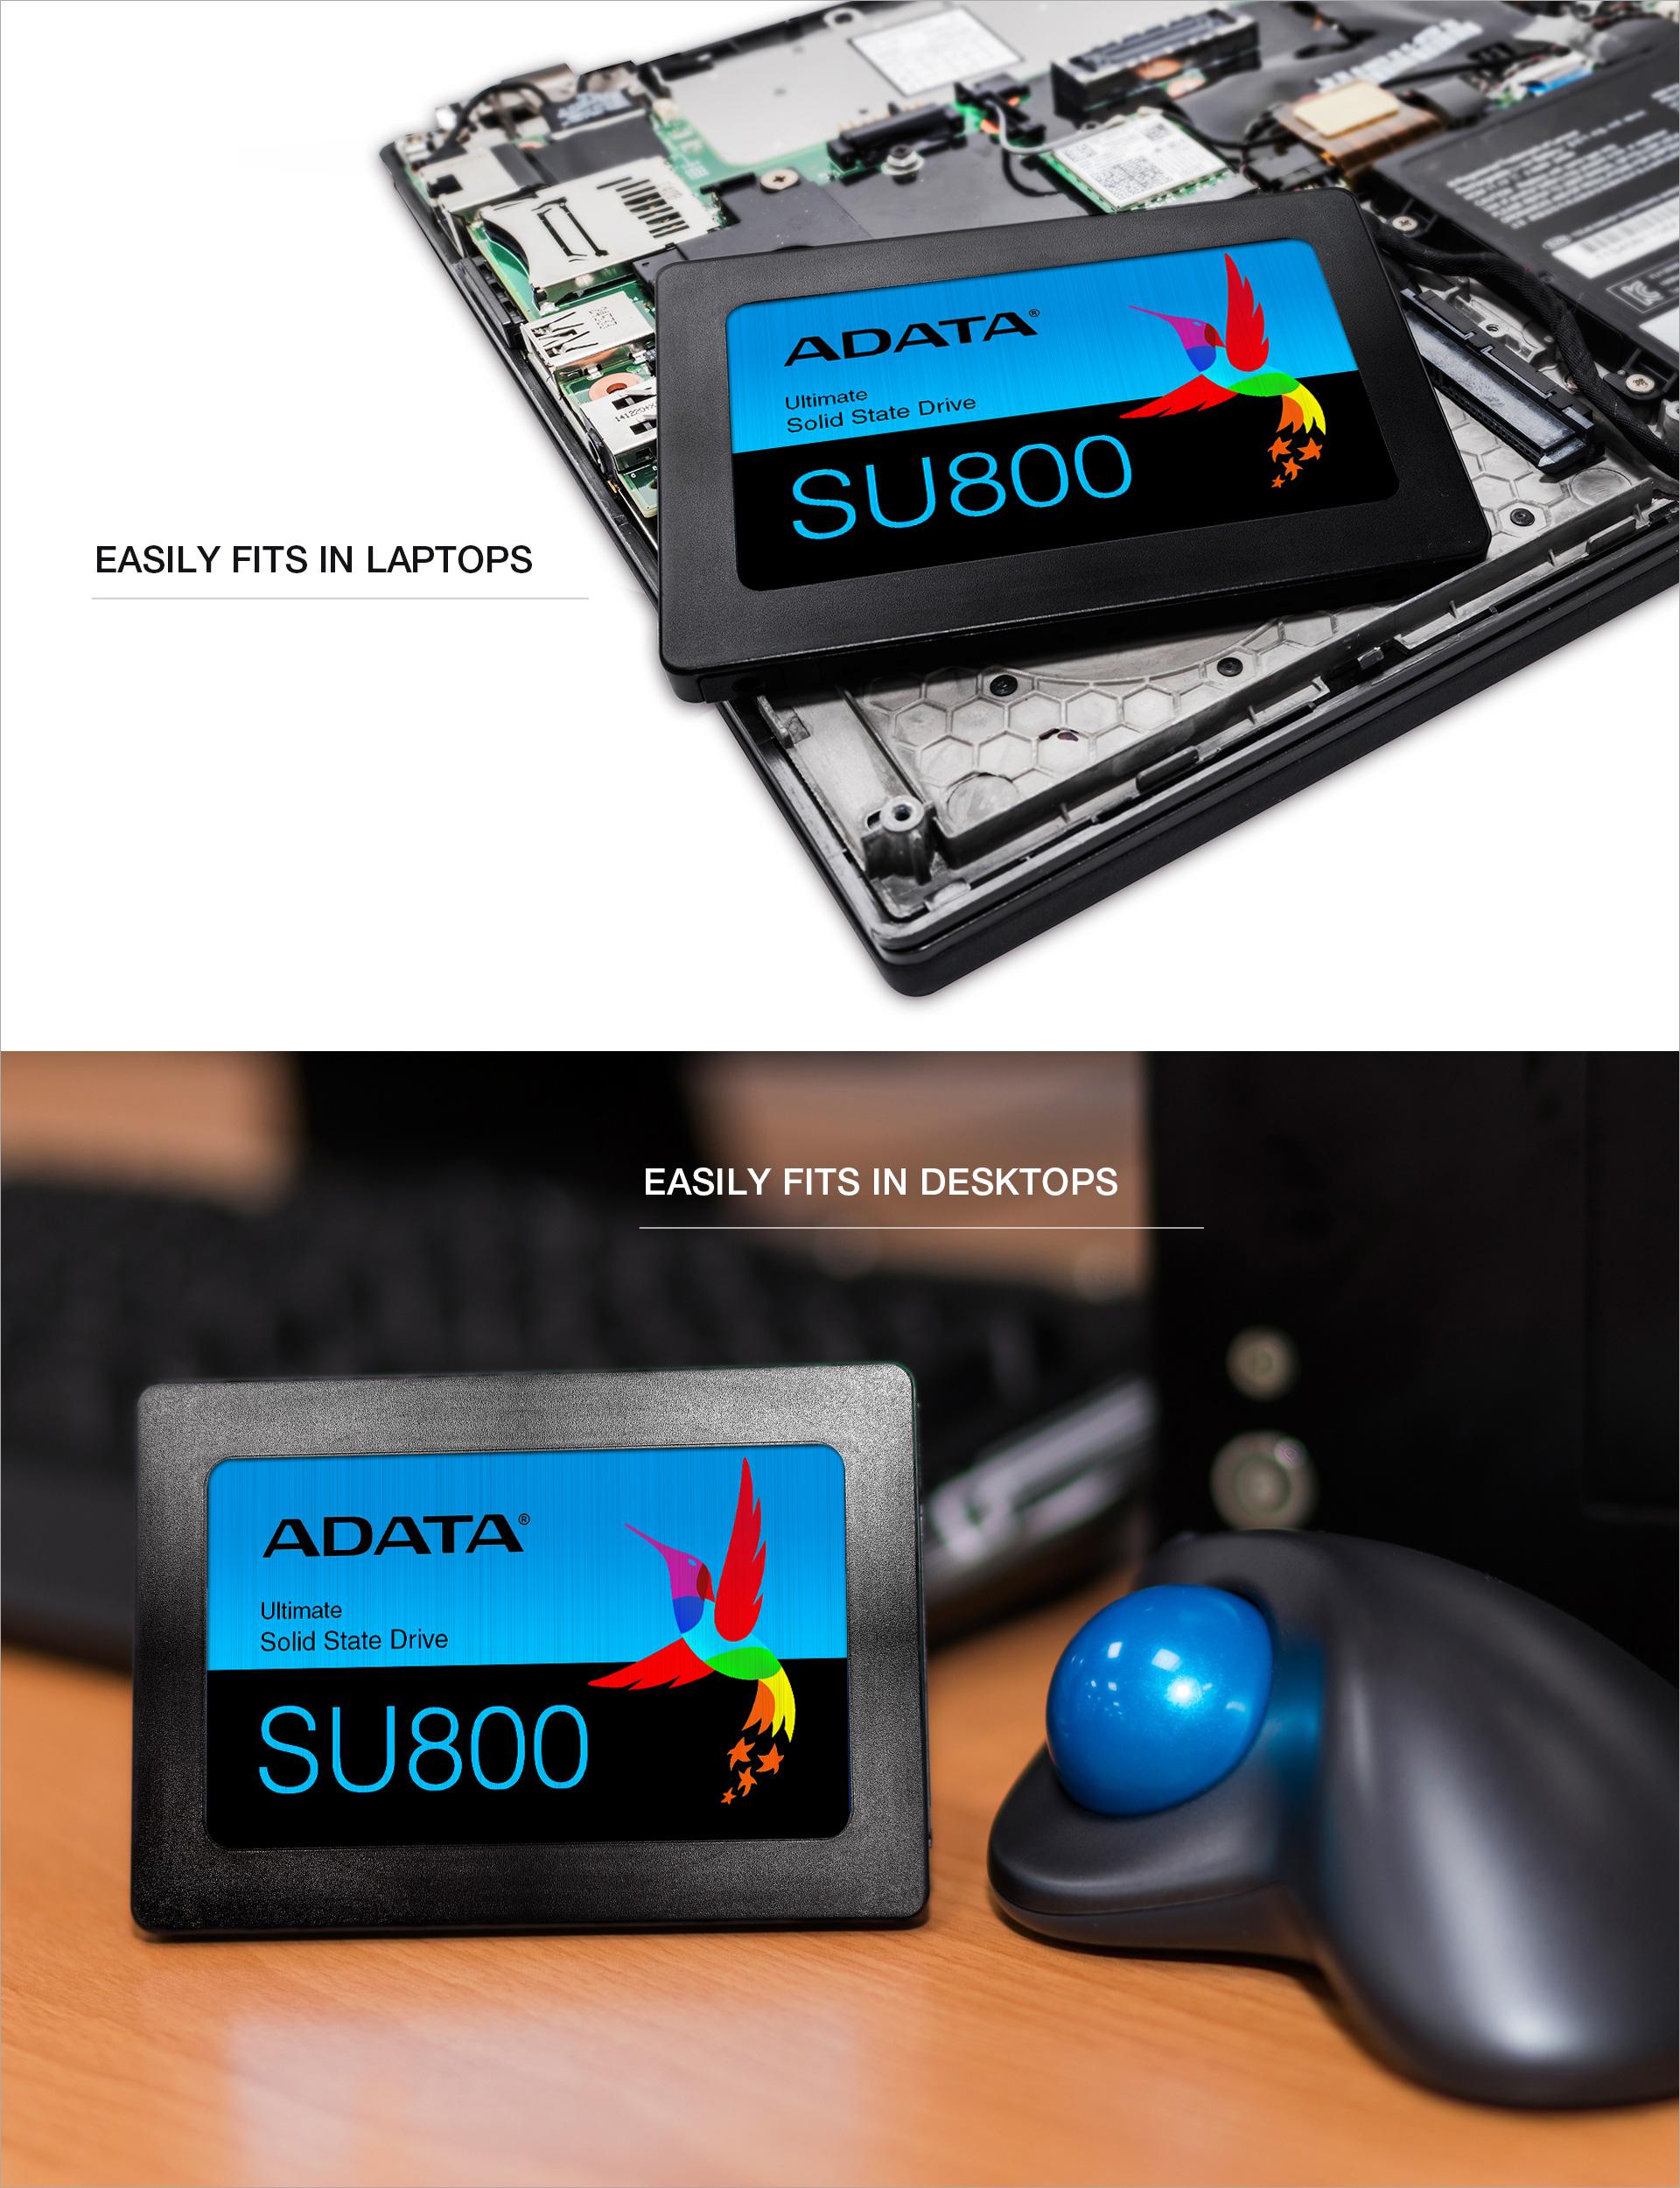 ASU800SS-1TT-C ADATA Ultimate Su800 1TB 3D Nand 2.5 Inch SATA III Internal SSD